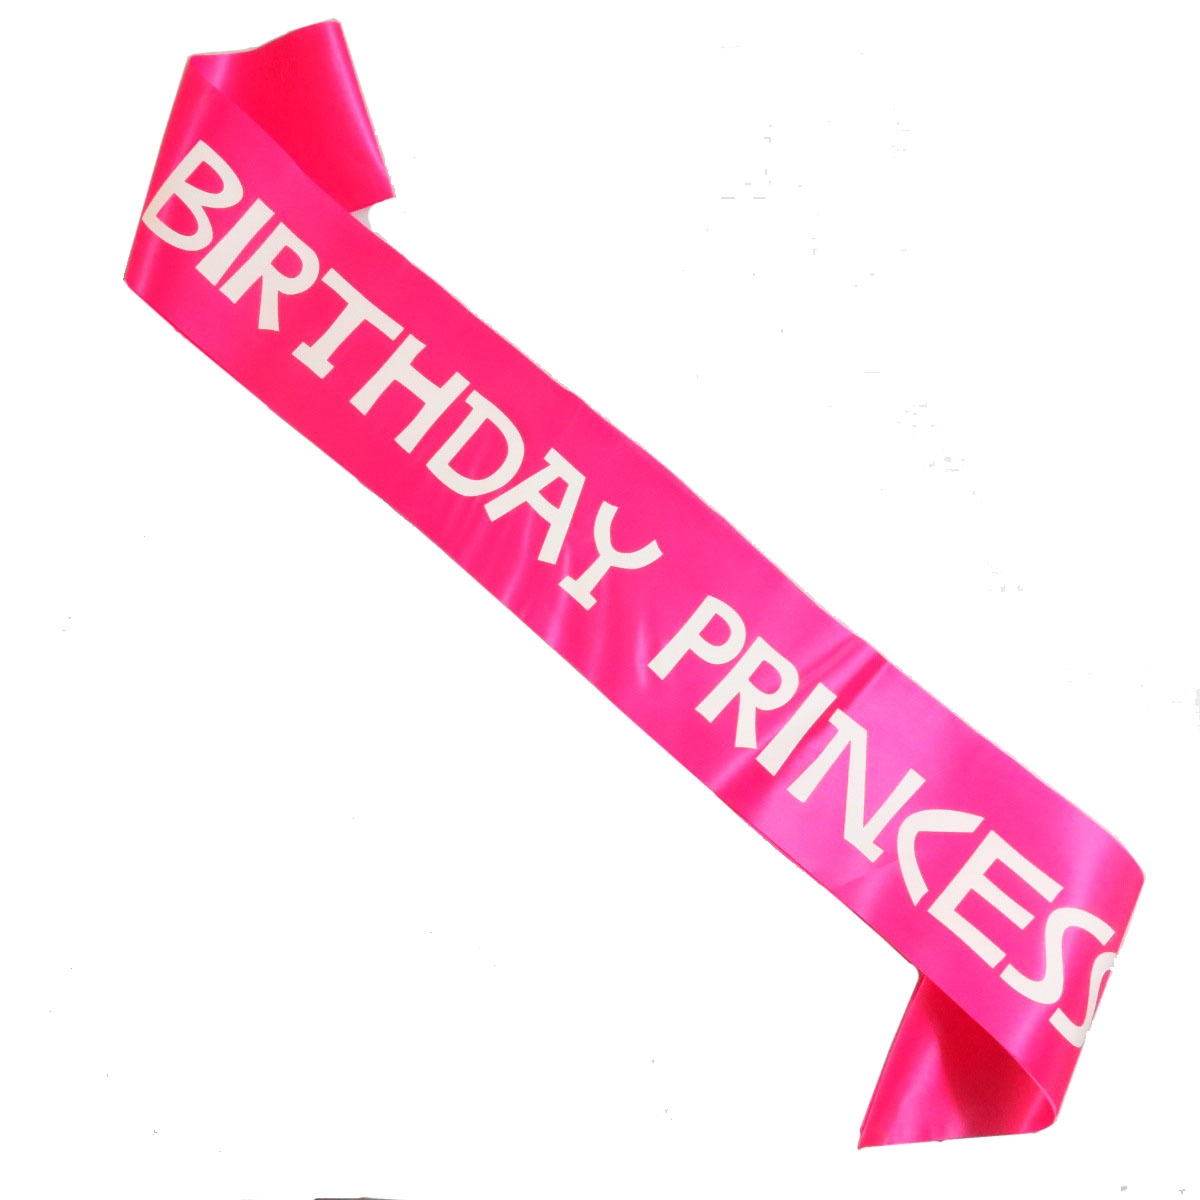 Birthday Princess sash white or black printing new design of satin ribbon girls princess birthday party favors